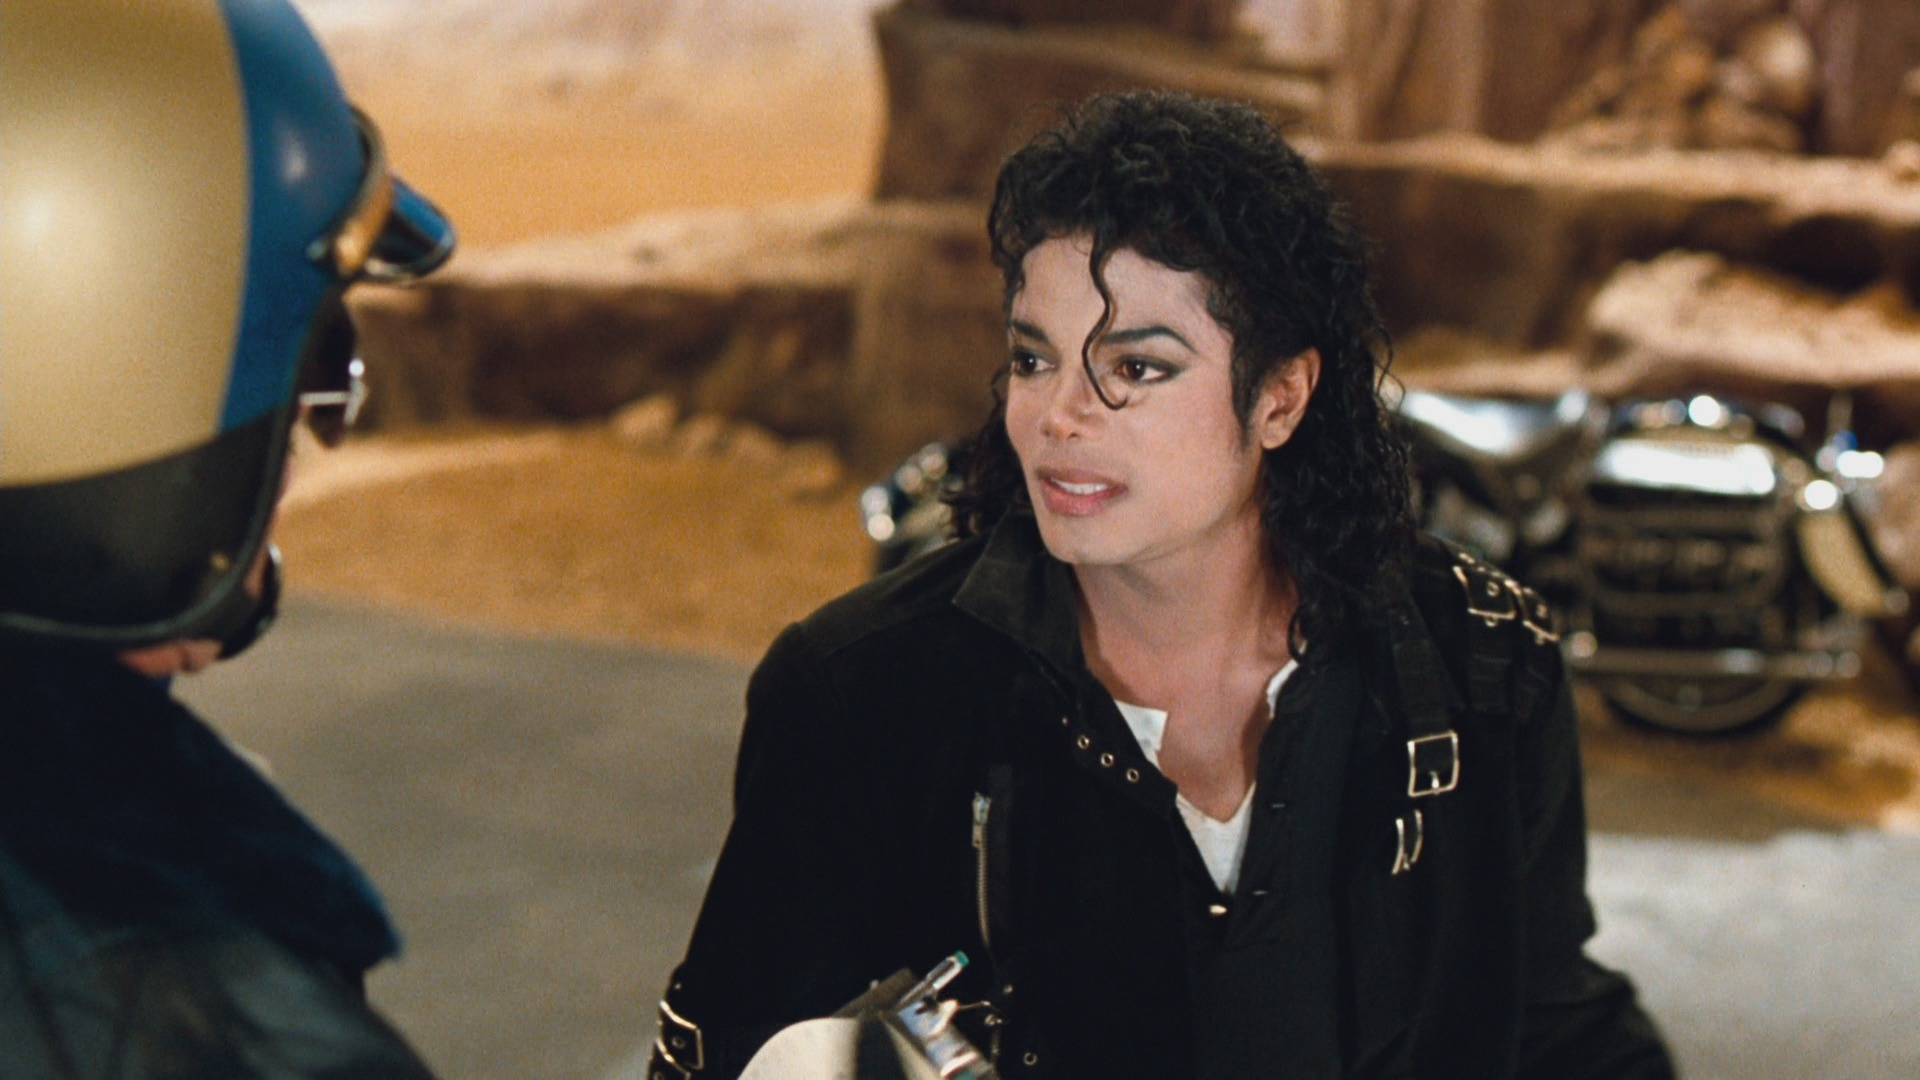 Speed Demon - Michael Jackson